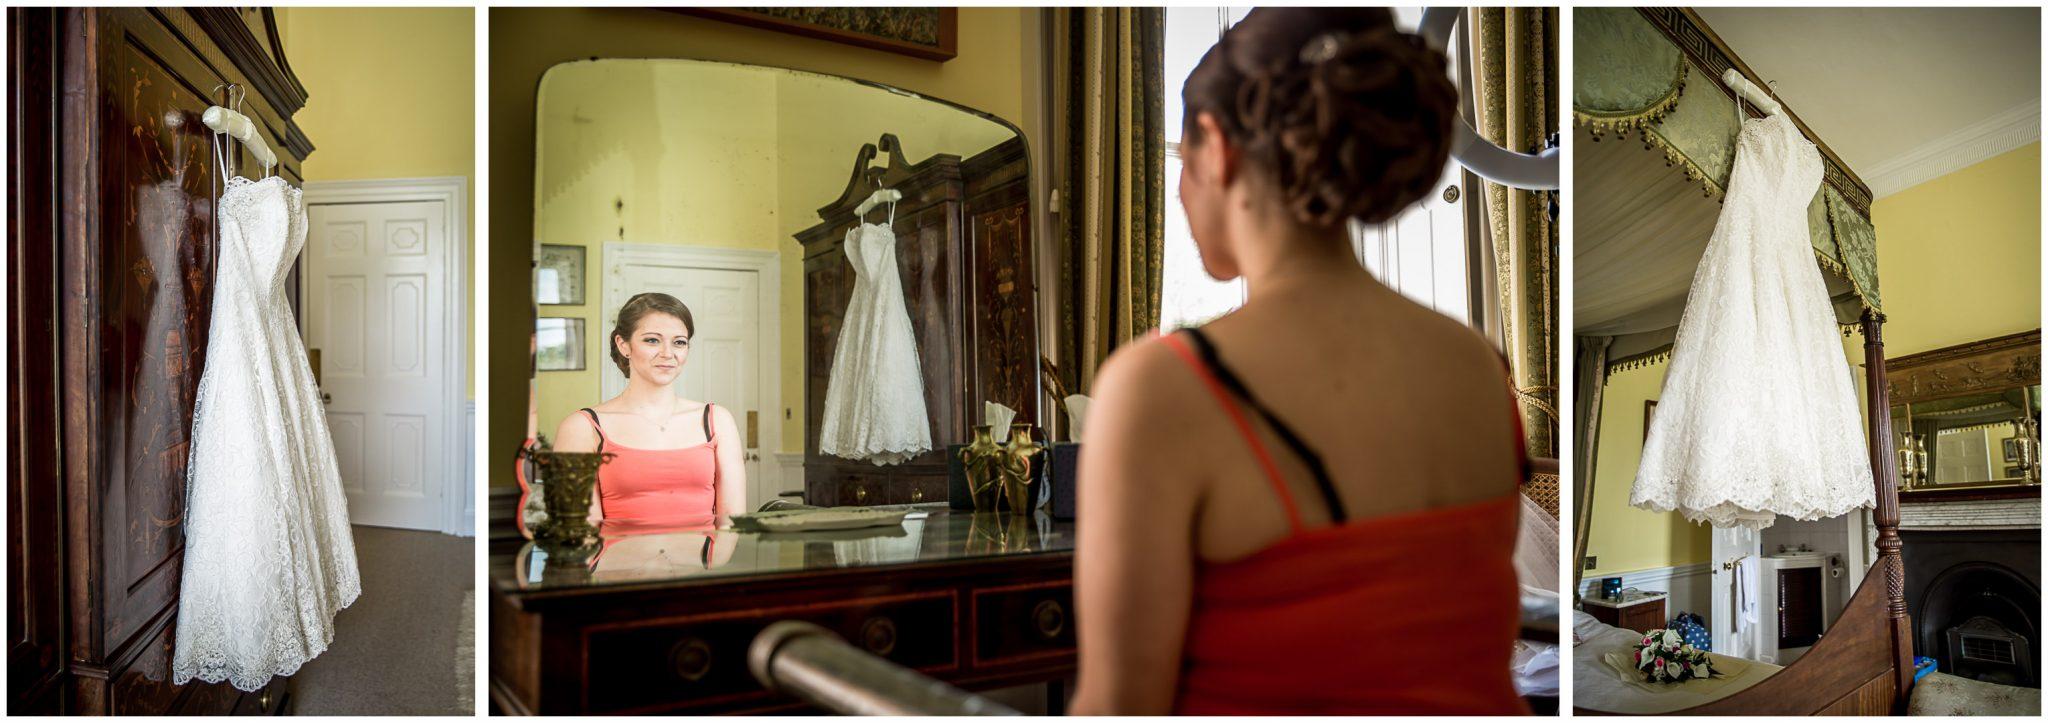 Avington Park wedding photography dress hanging